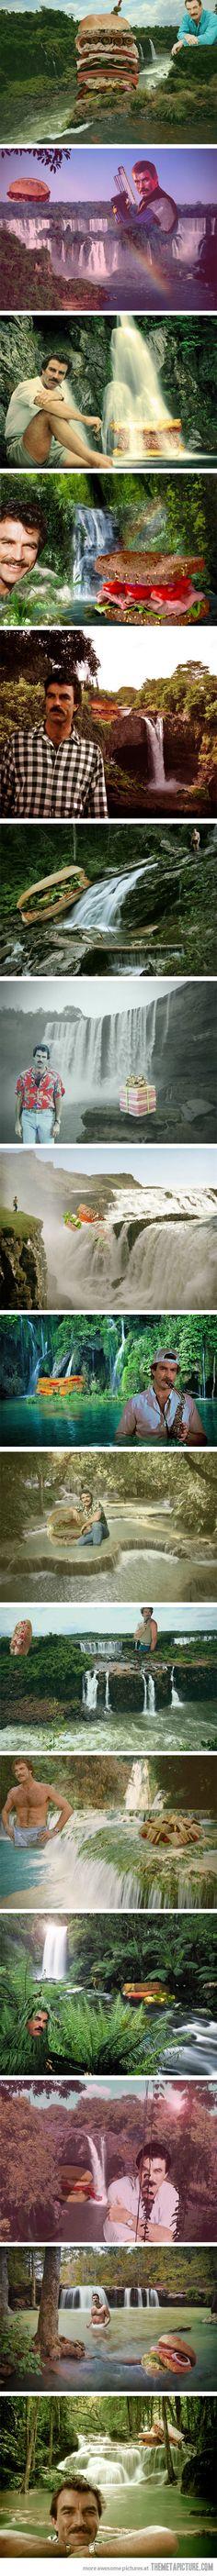 Tom Selleck waterfall sandwich photos